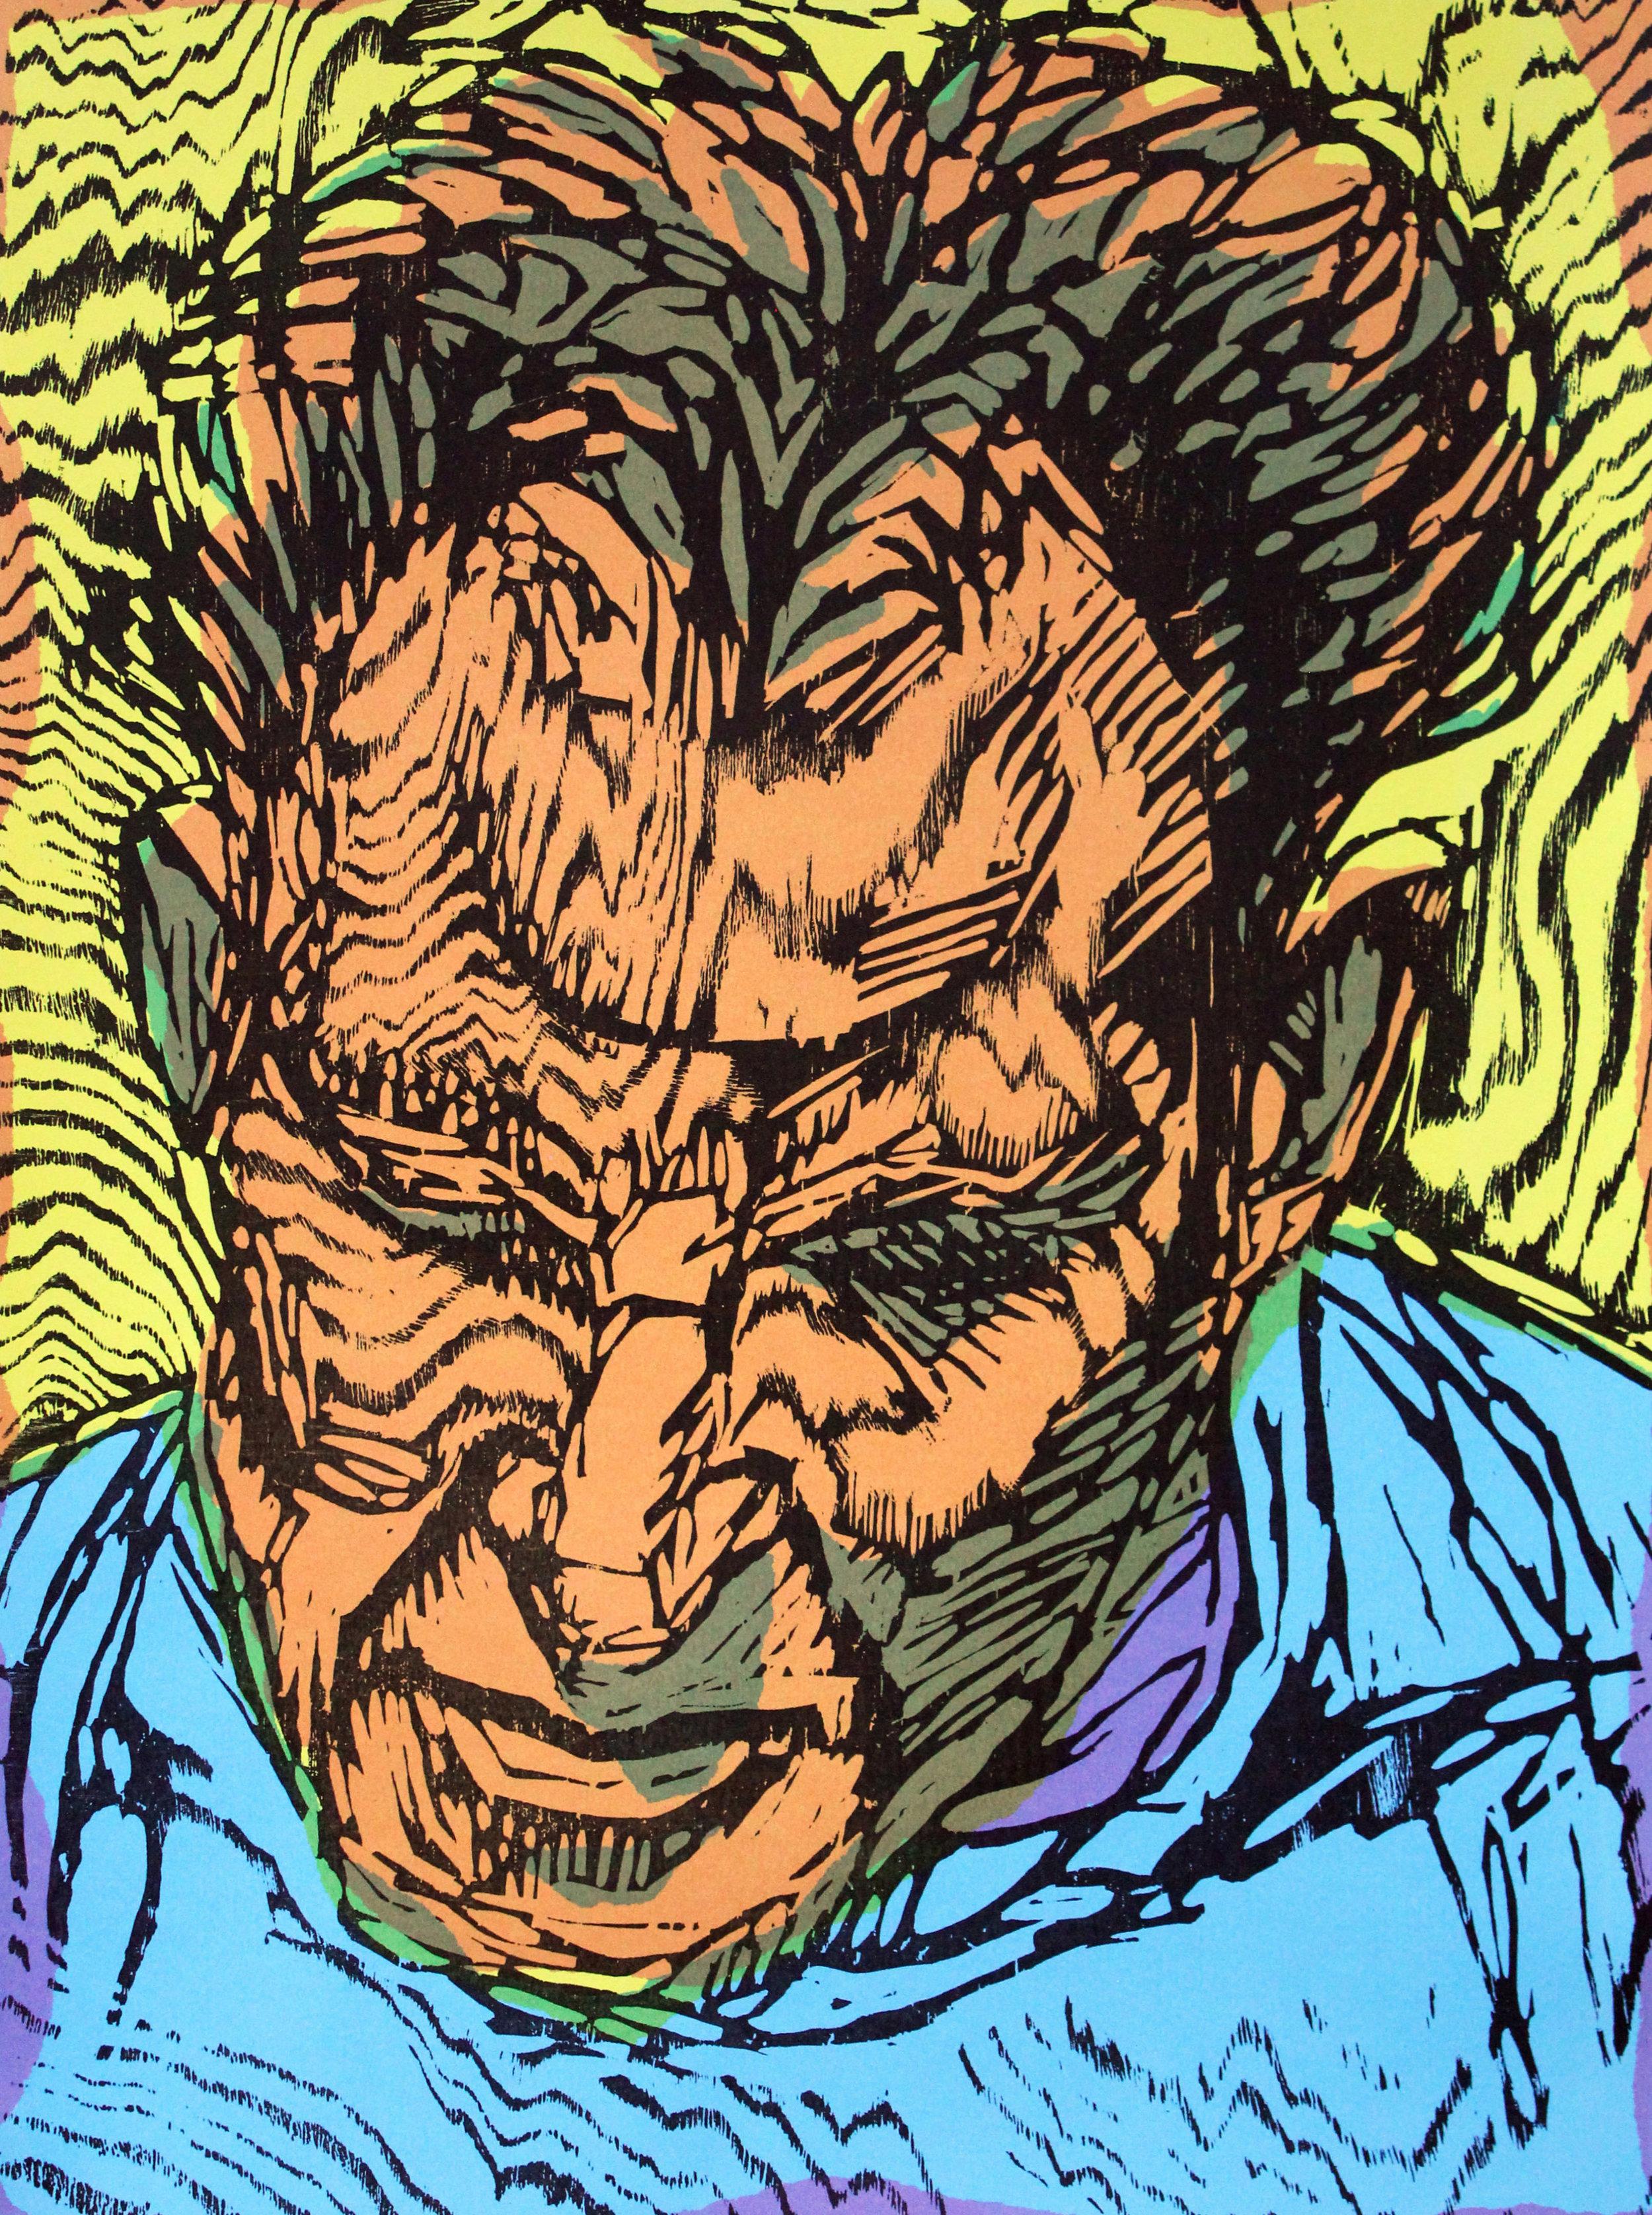 """Frank after Freud"" 2019, woodcut and screenprint 22""x 29"